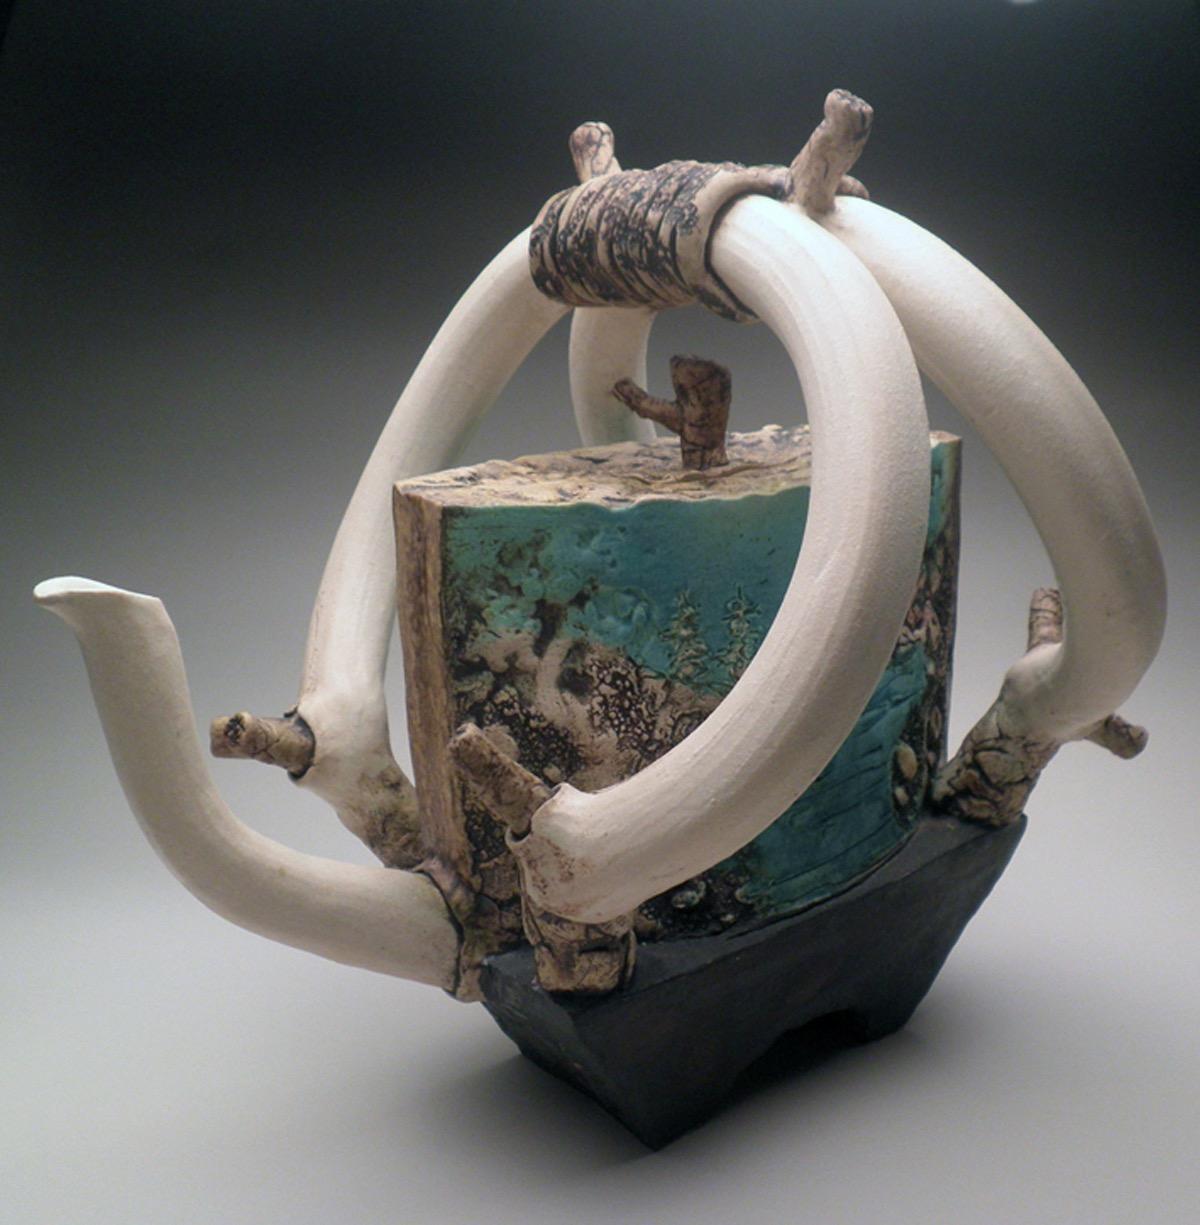 "#5. _Serenity Teapot,_ White Stoneware, 15.5"" x 12"" x 12,"" oxidation, cone 6 and 06, 2010"